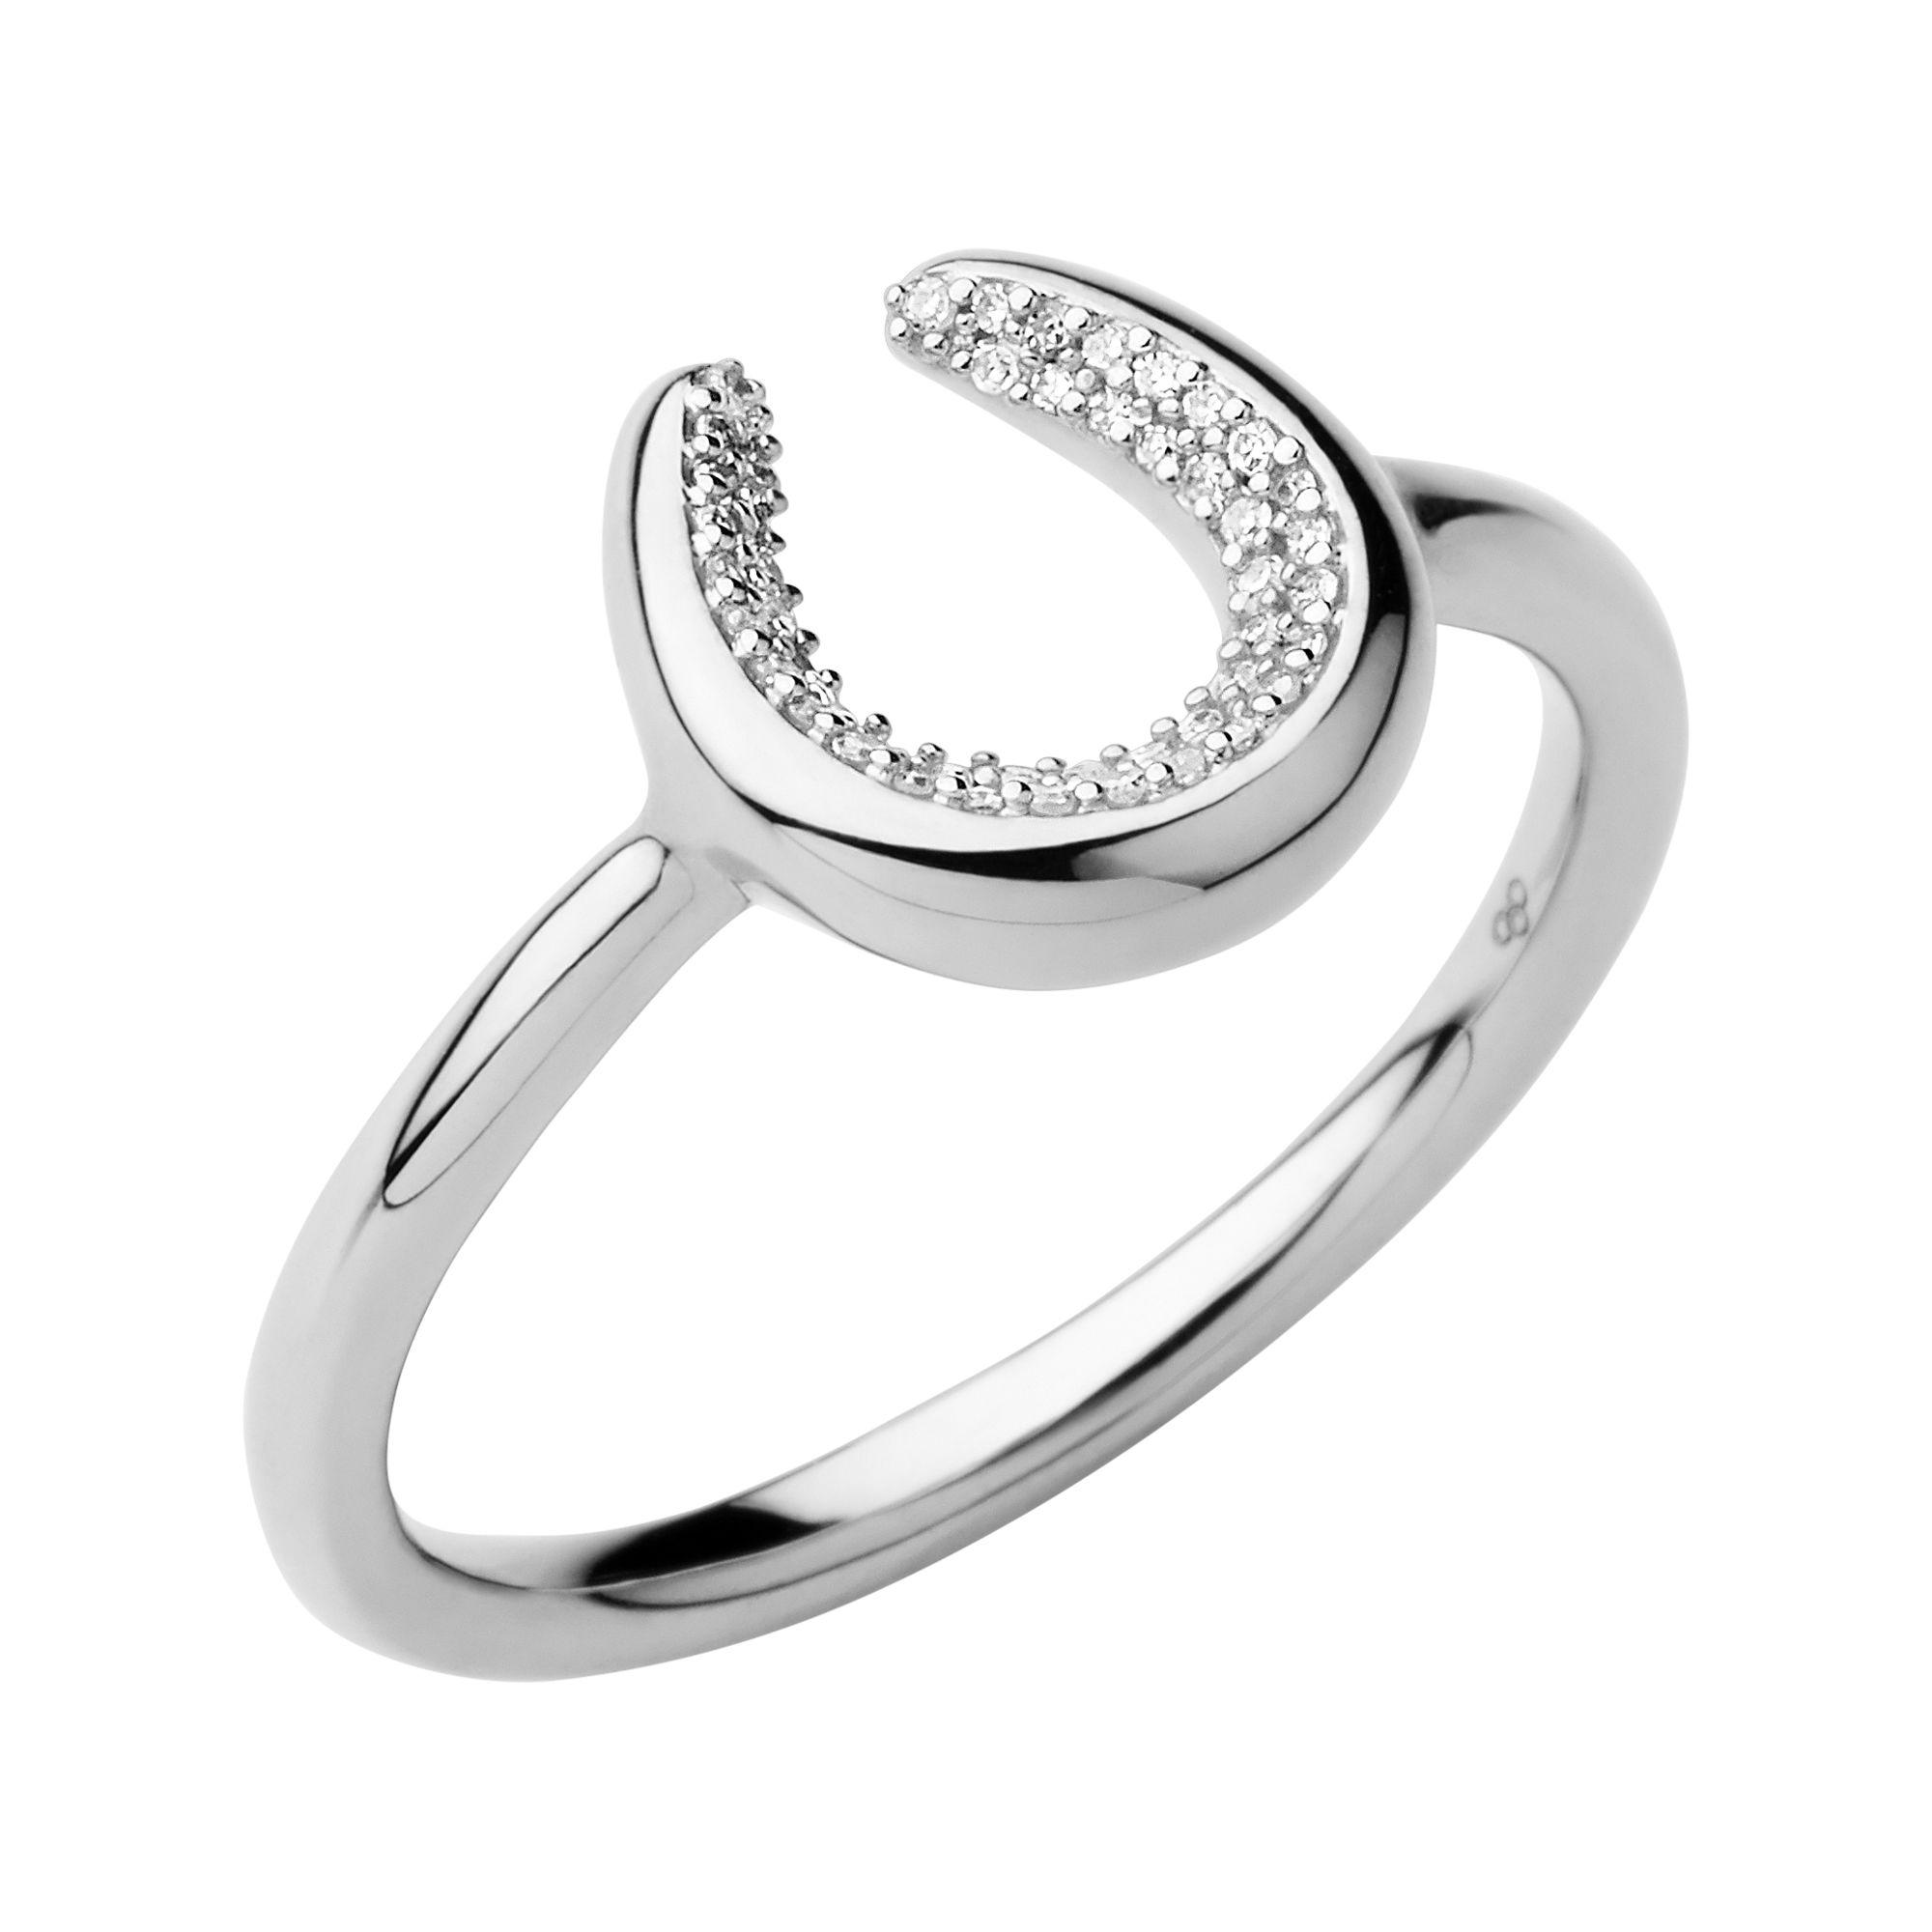 Ascot Diamond Essentials Sterling Silver Horseshoe Ring</a>  </div>     </div>   <div class=